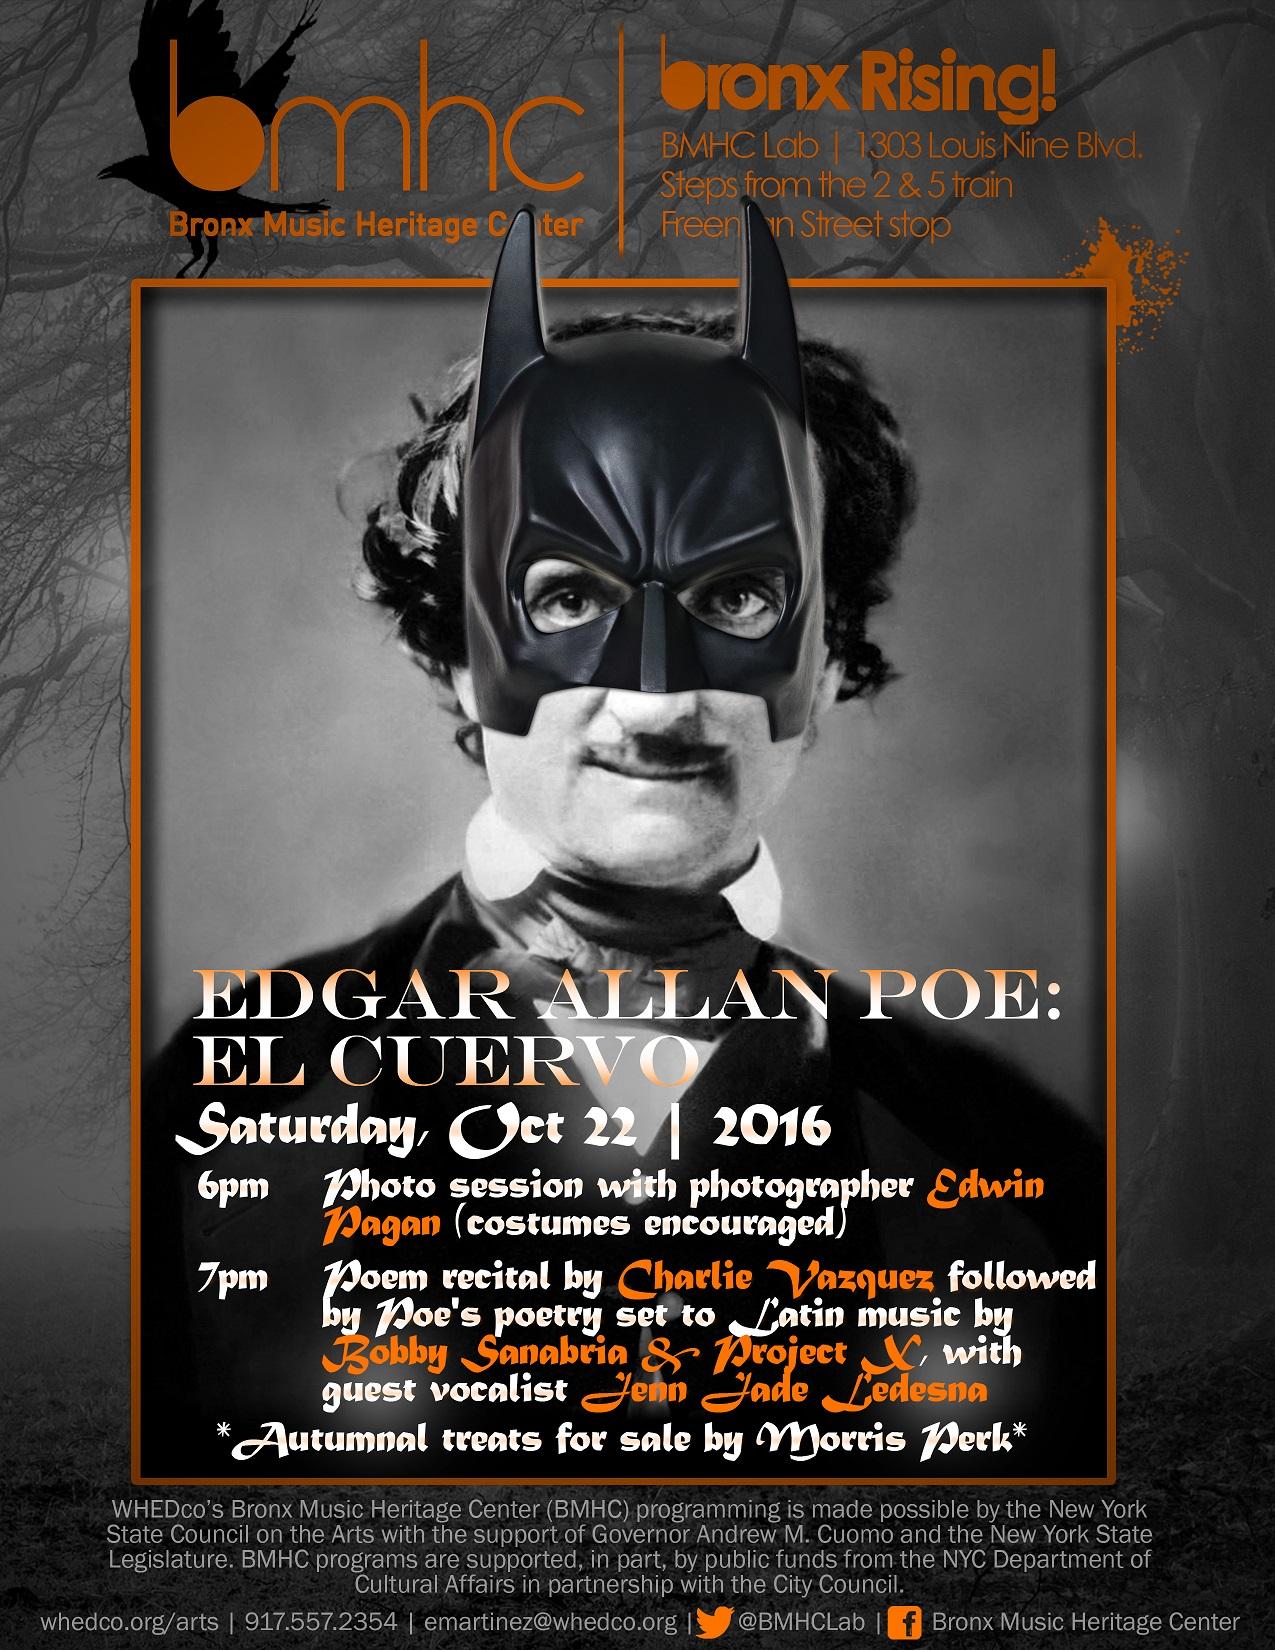 Flyer for October Bronx Rising, Edgar Allan Poe, at Bronx Music Heritage Center lab.